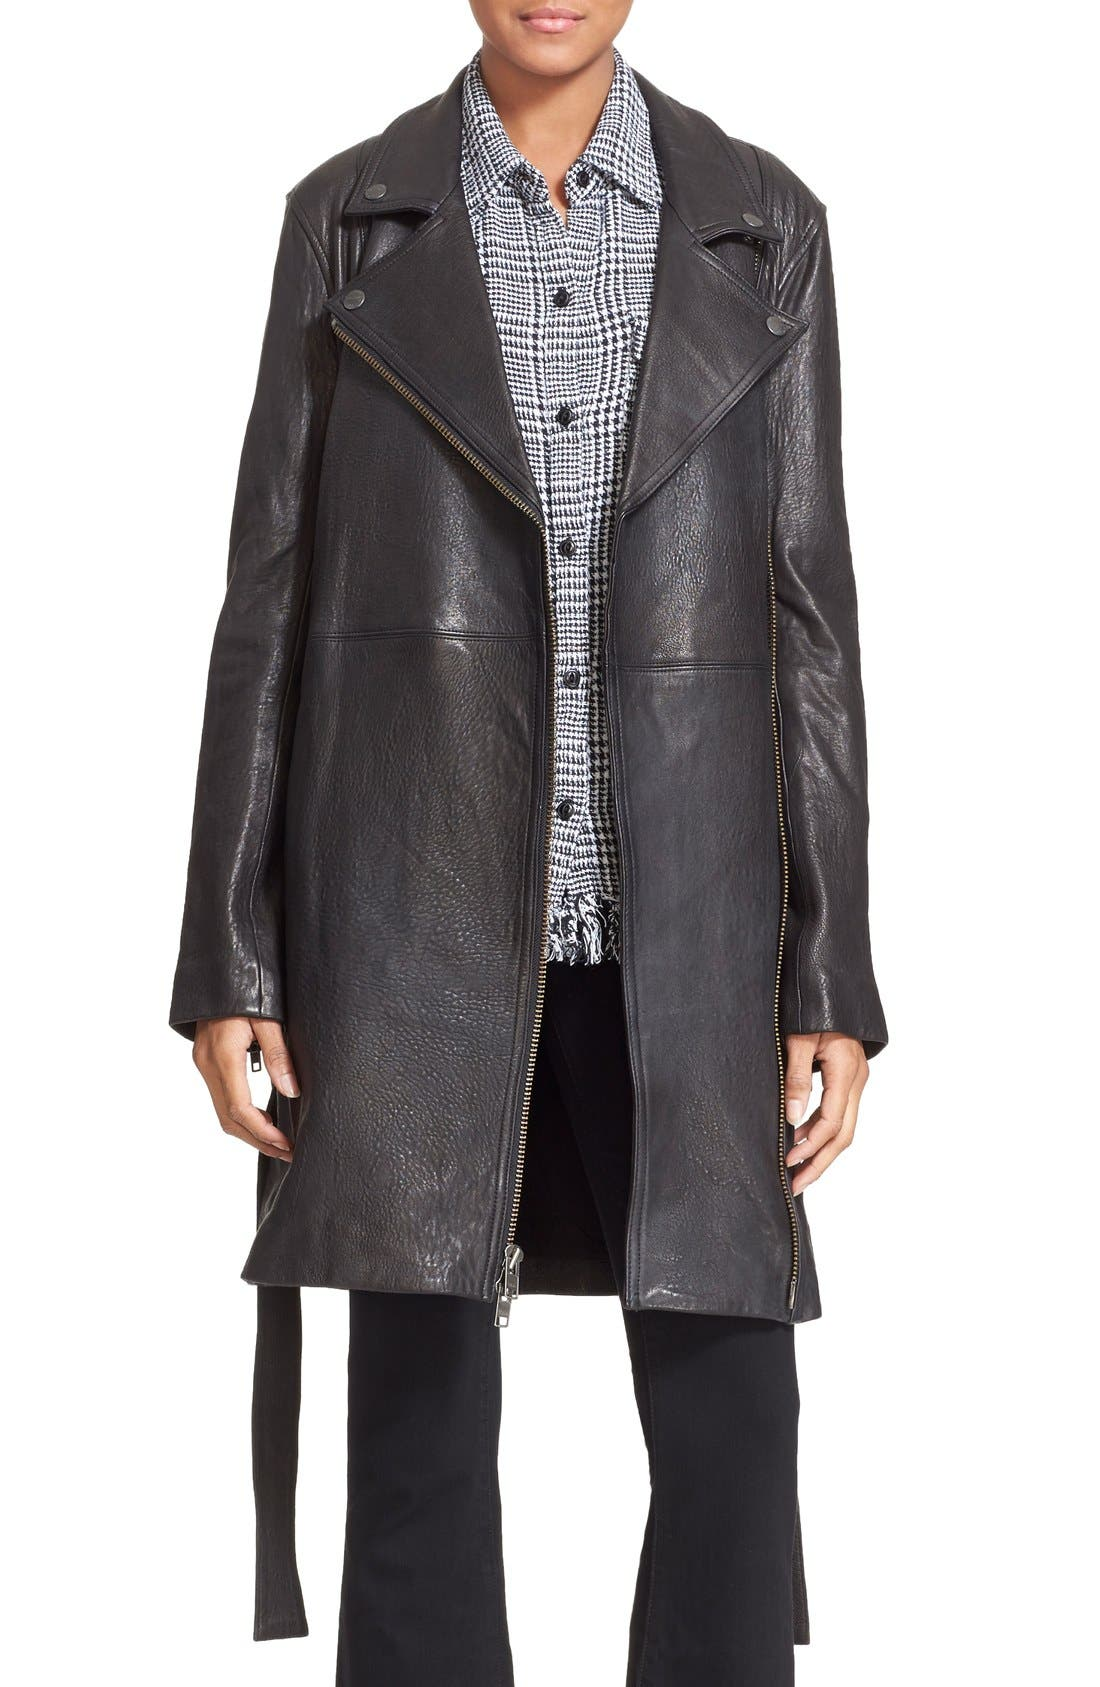 Main Image - Current/Elliott 'The Long Moto' Lambskin Leather Moto Trench Coat